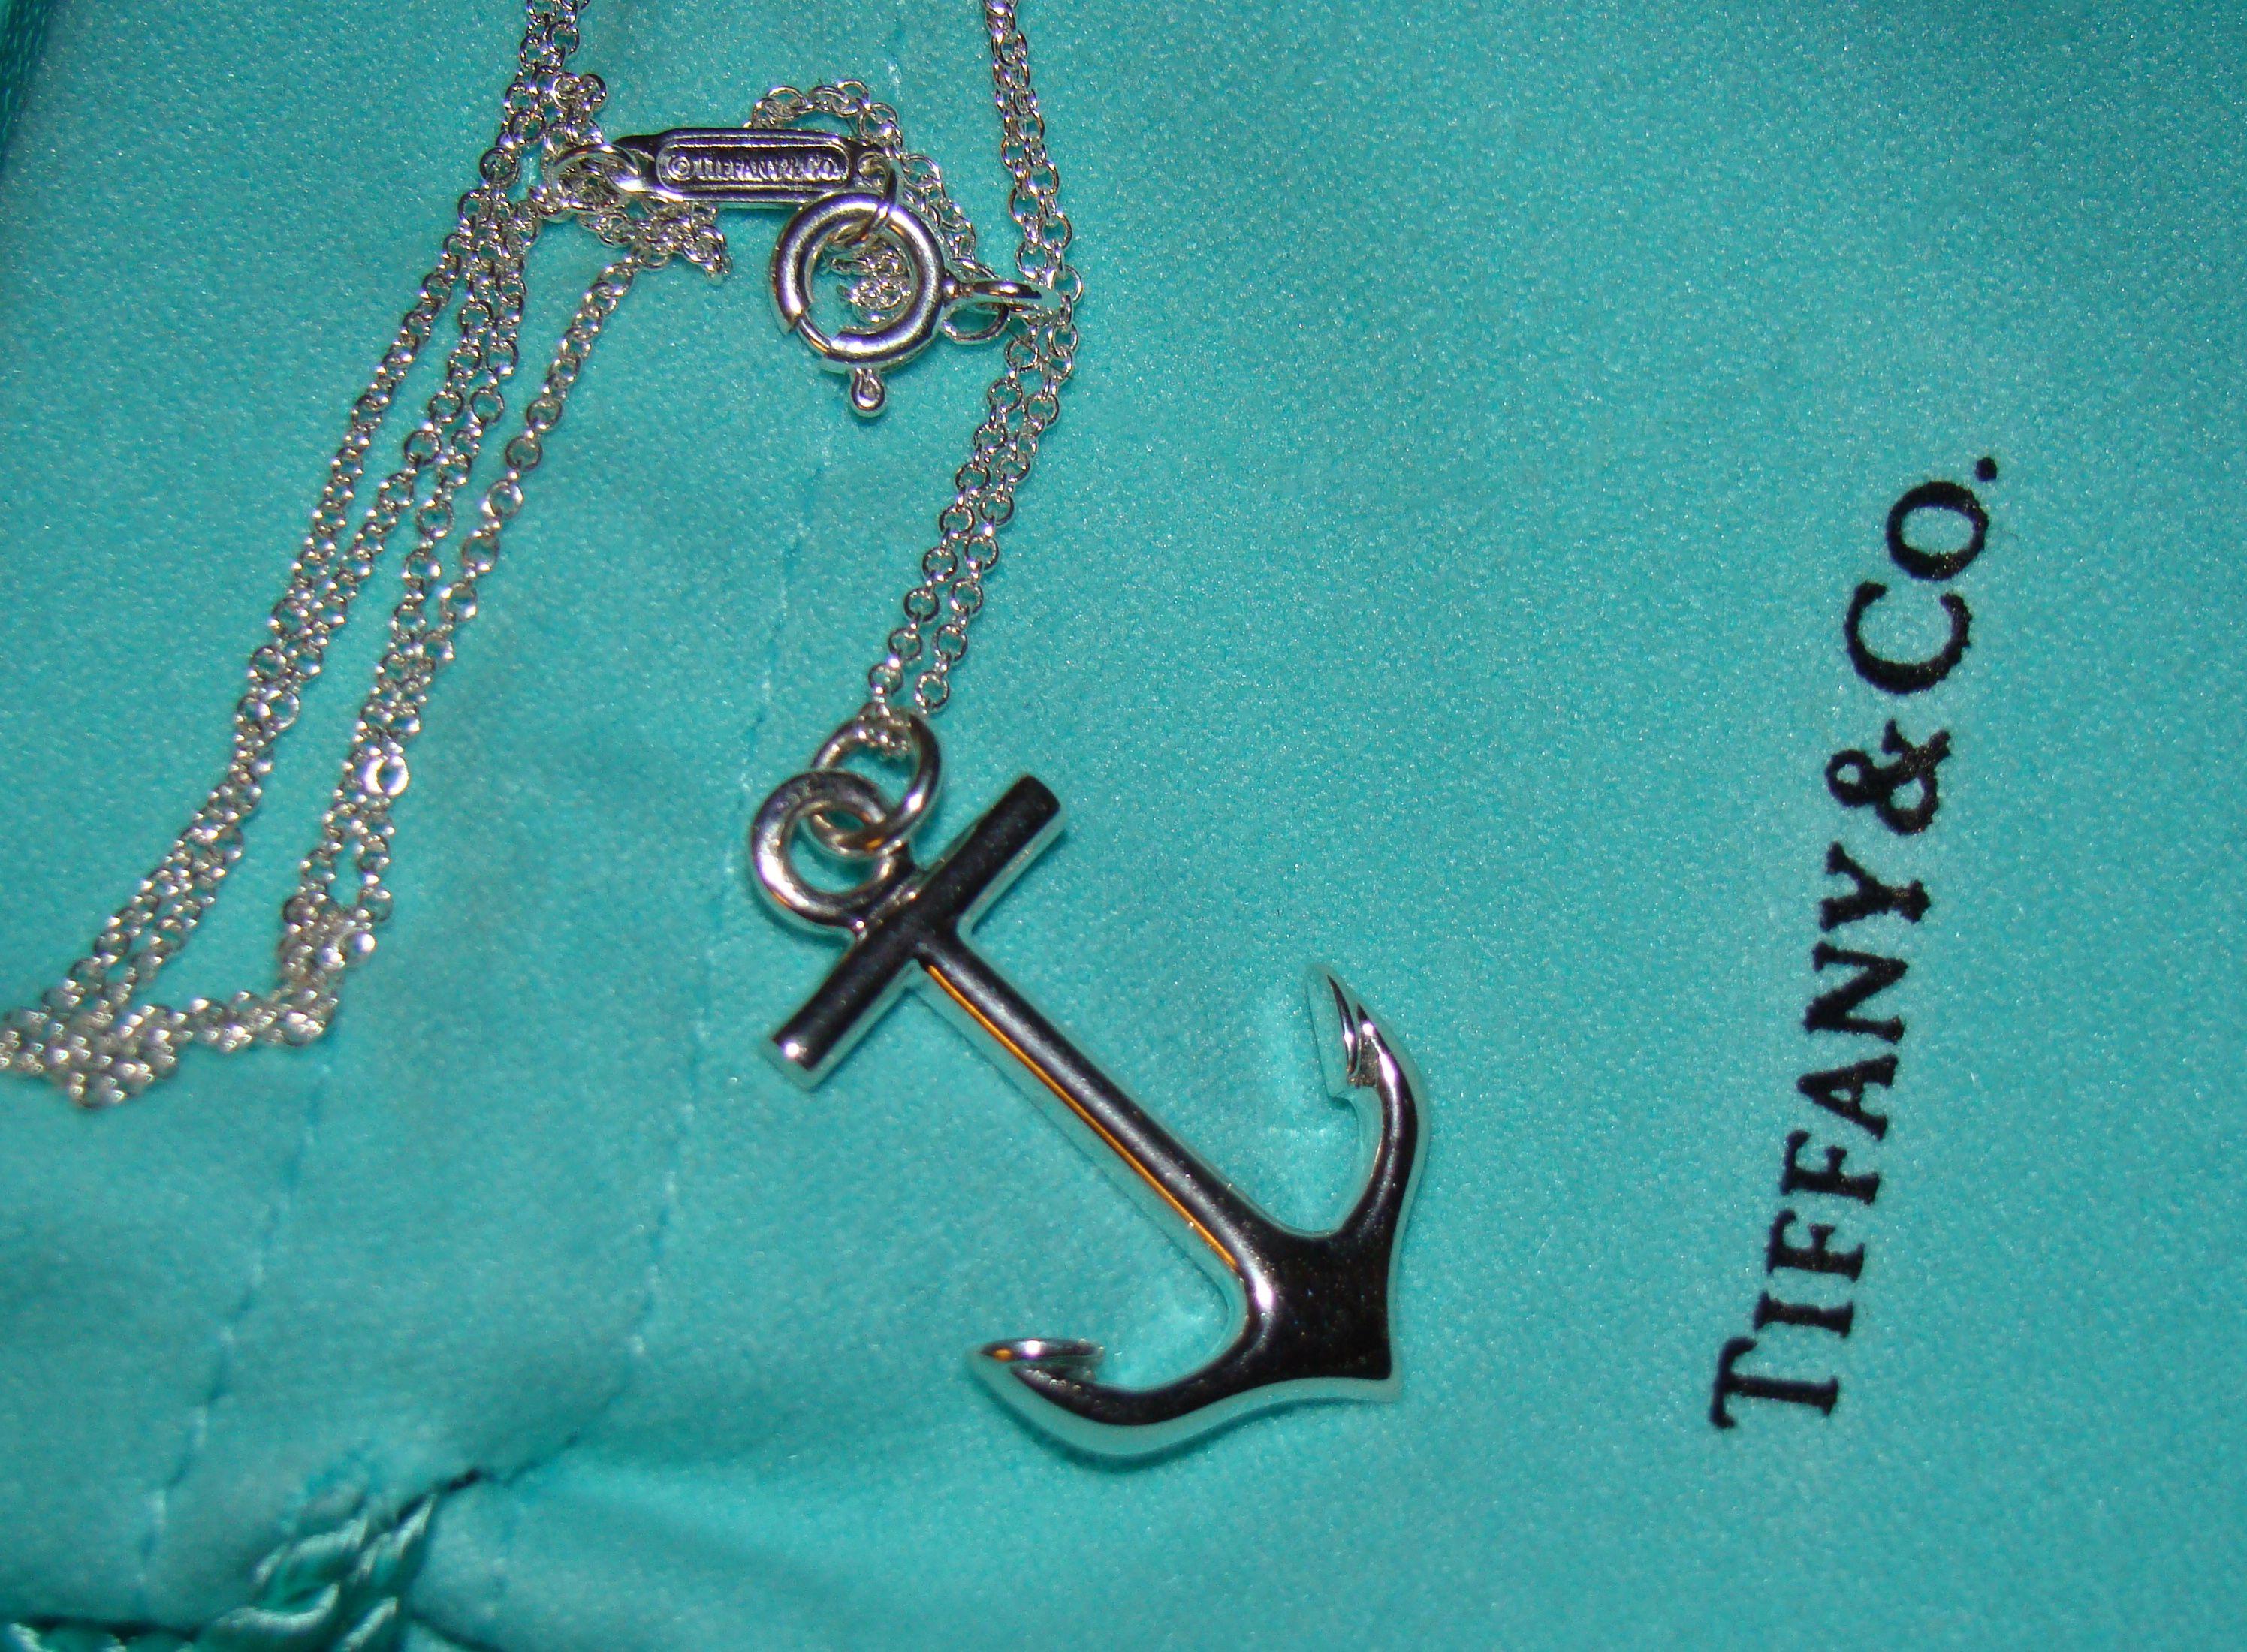 38+ Delta gamma jewelry tiffany inspired info